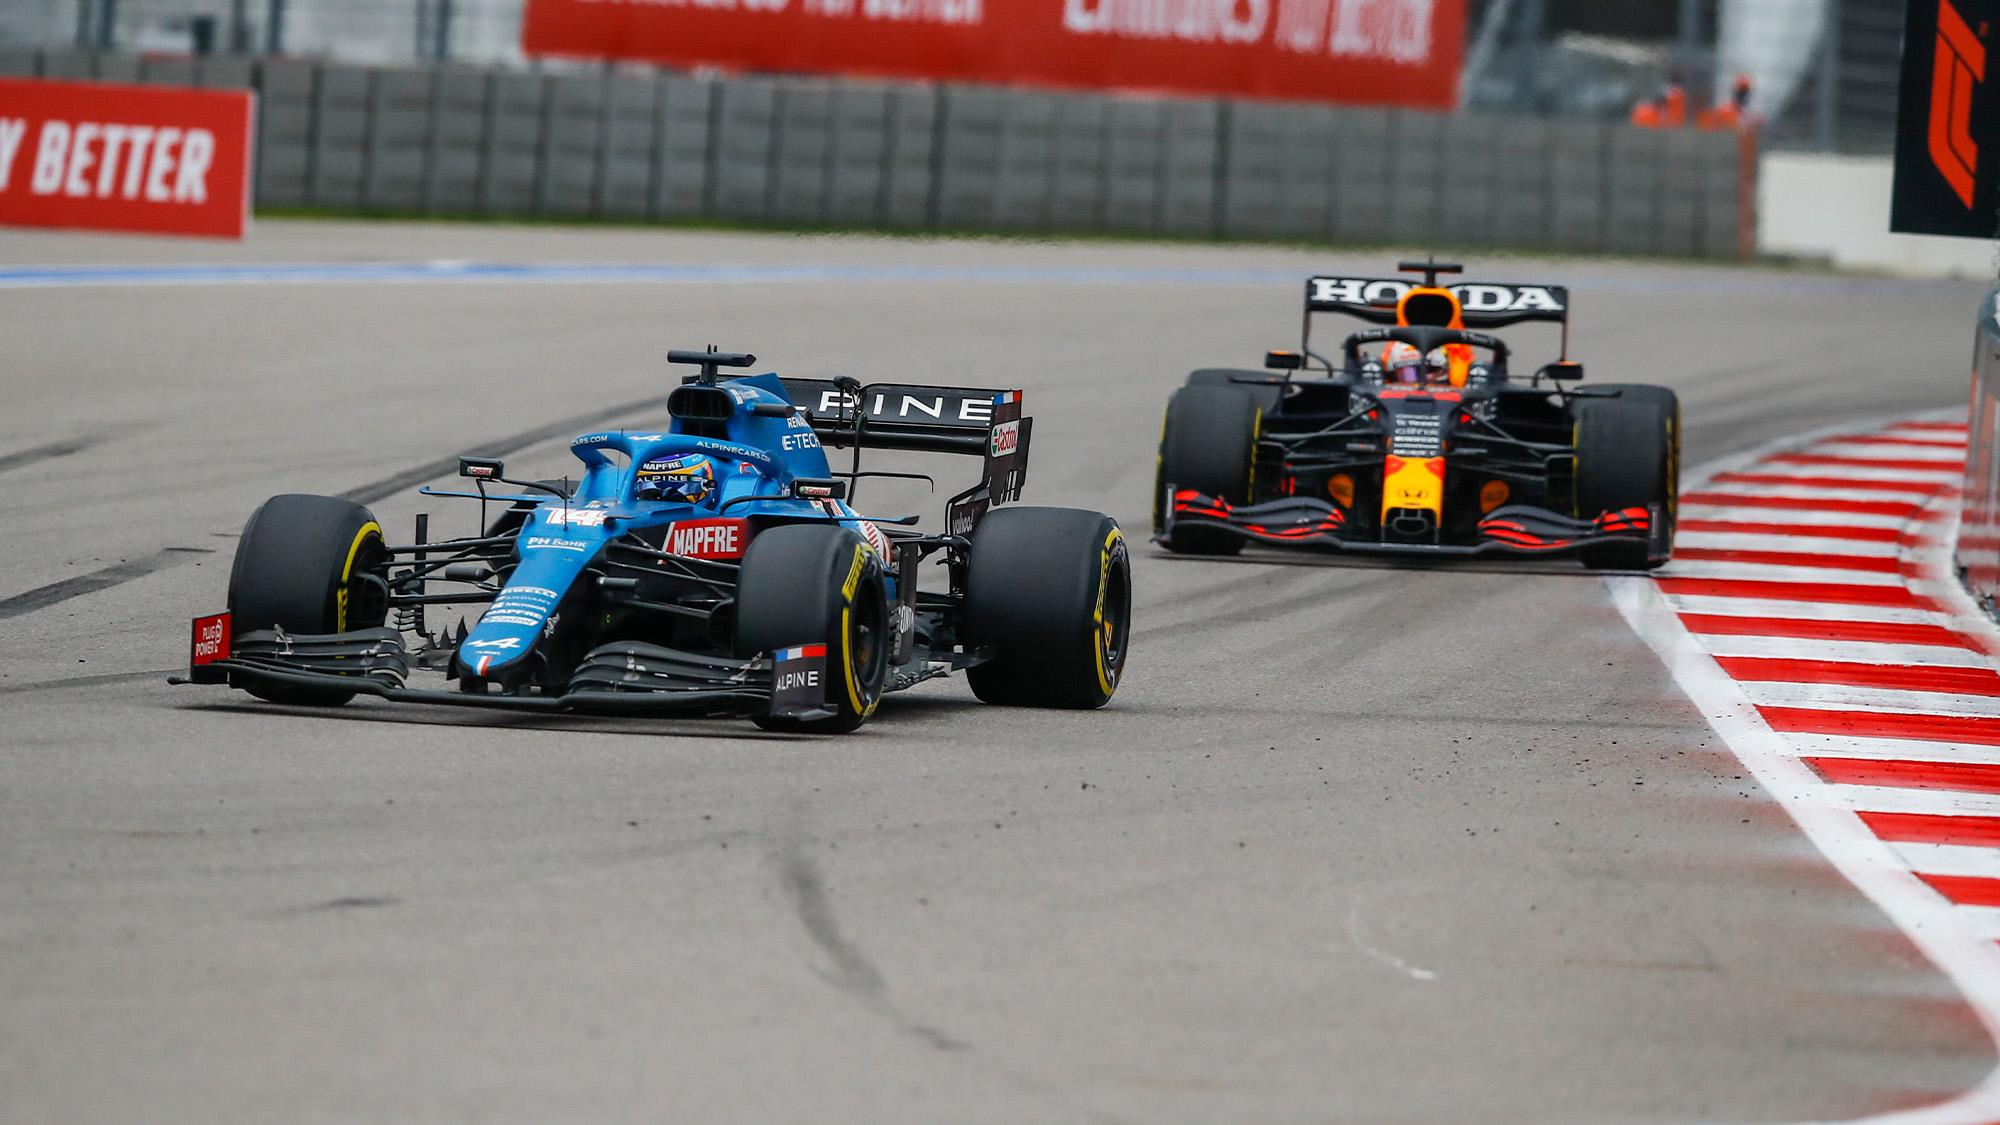 Fernando Alonso passes Max Verstappen in the 2021 Russian Grand Prix